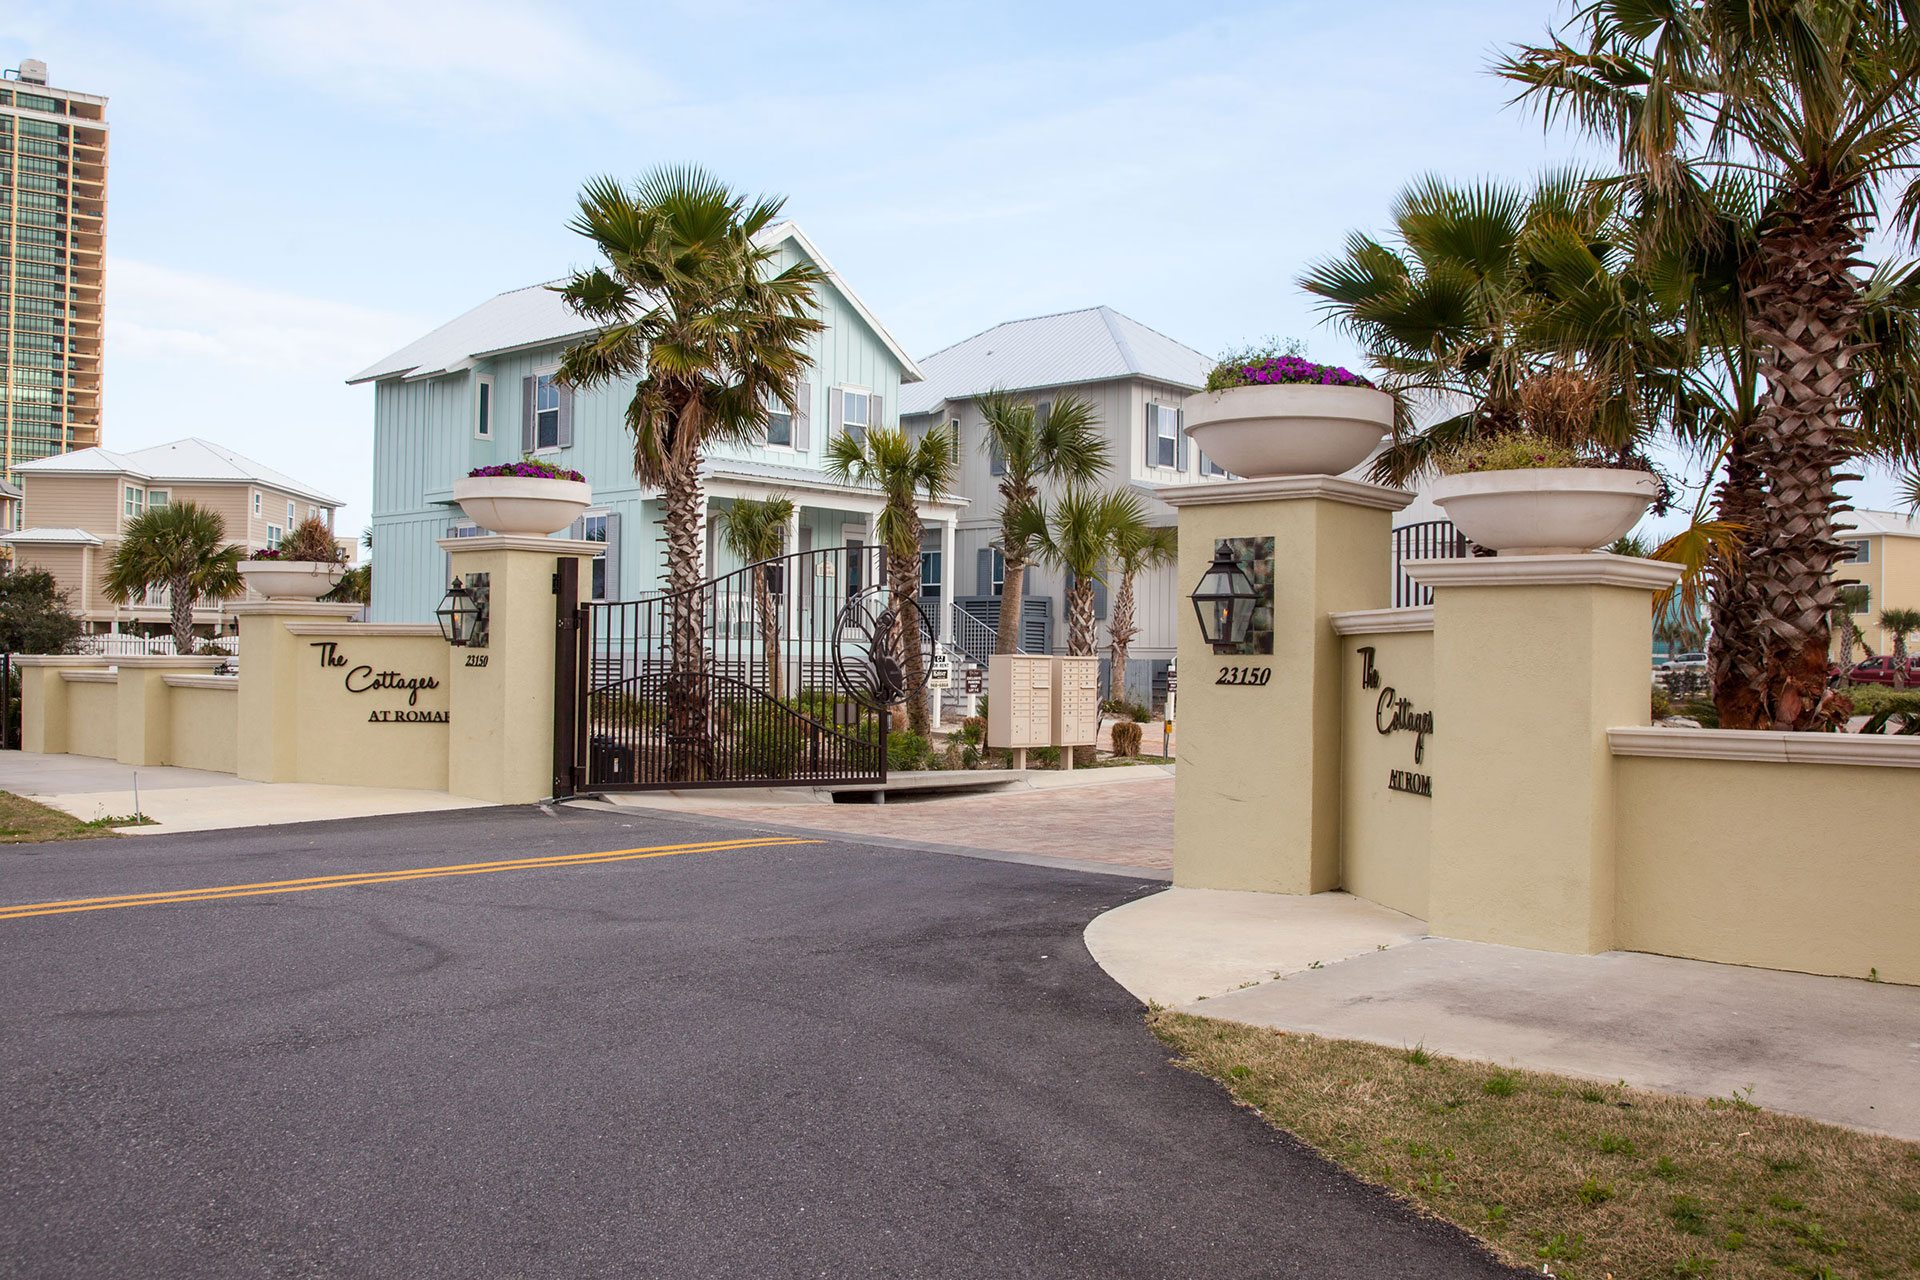 real blvd full image orange estate al property perdido beach cottages in of